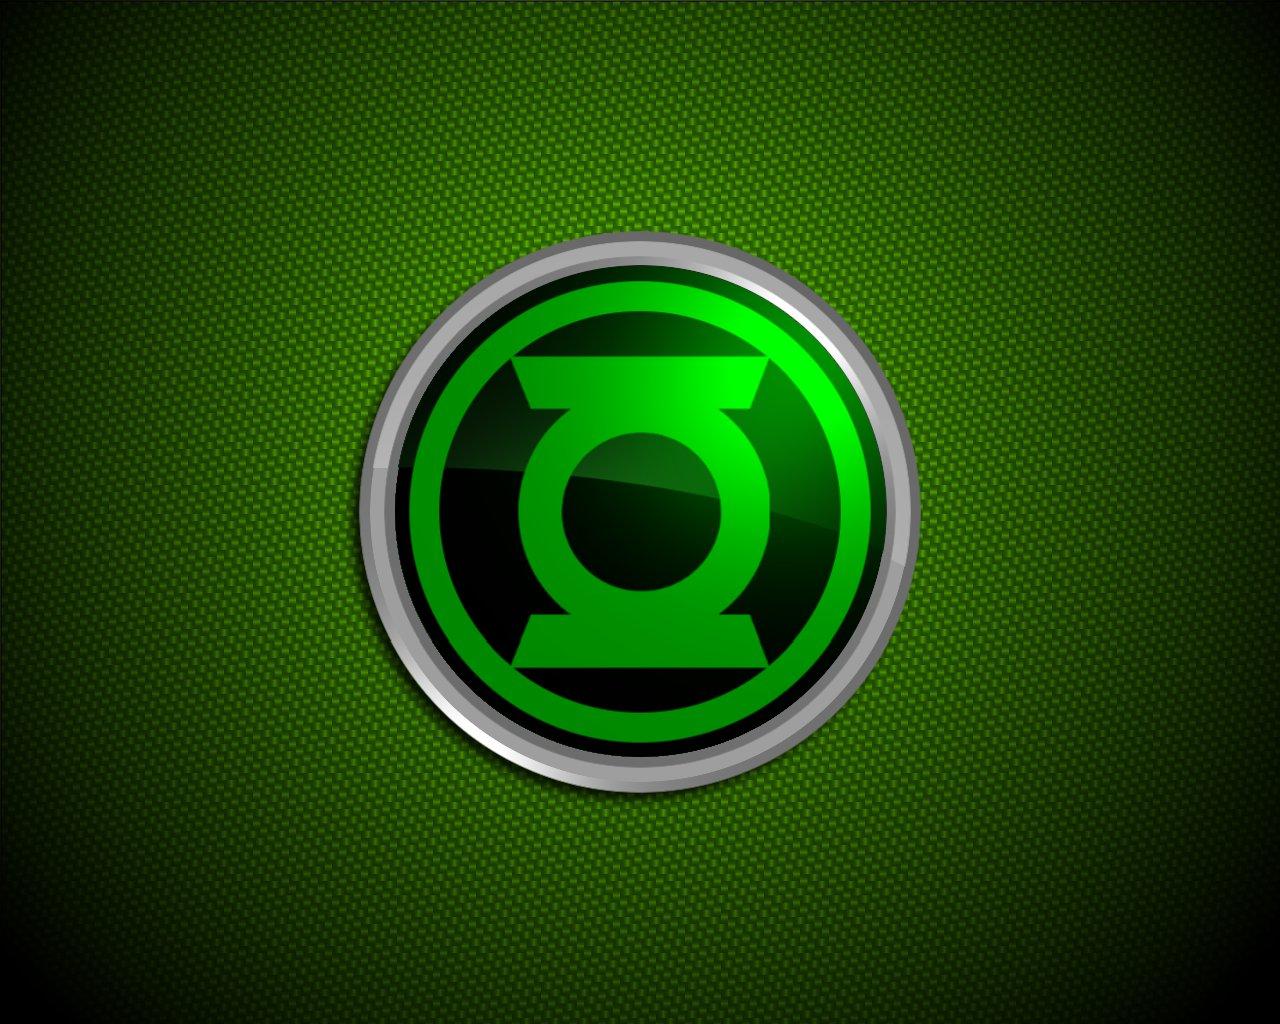 http://3.bp.blogspot.com/-RmByGGKbhAE/T10hkTT2whI/AAAAAAAAAQ4/pKO4WEs3hhA/s1600/Green_Lantern_wallpaper_by_MysterMDD.jpg